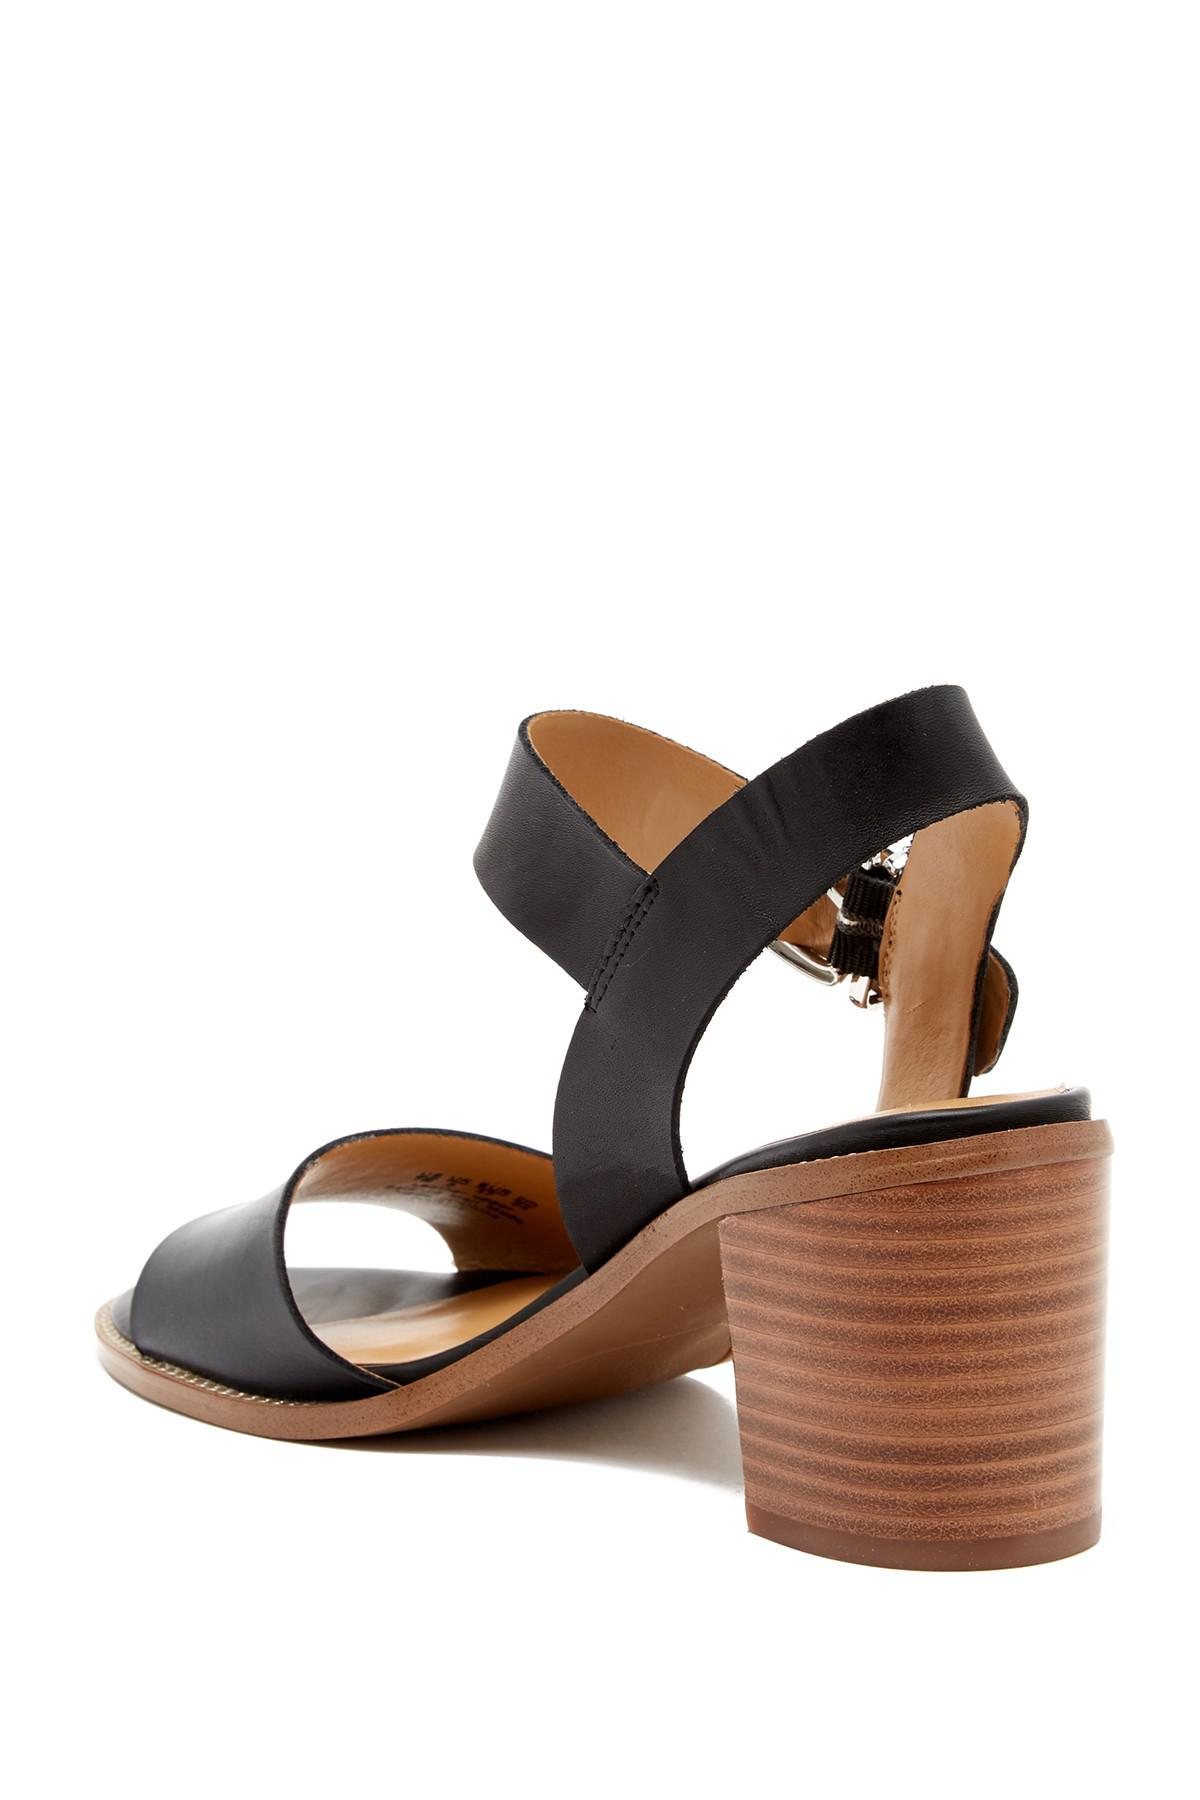 3e98ae3a0554 Franco Sarto - Black Harlie Ankle Strap Leather Sandal - Lyst. View  fullscreen